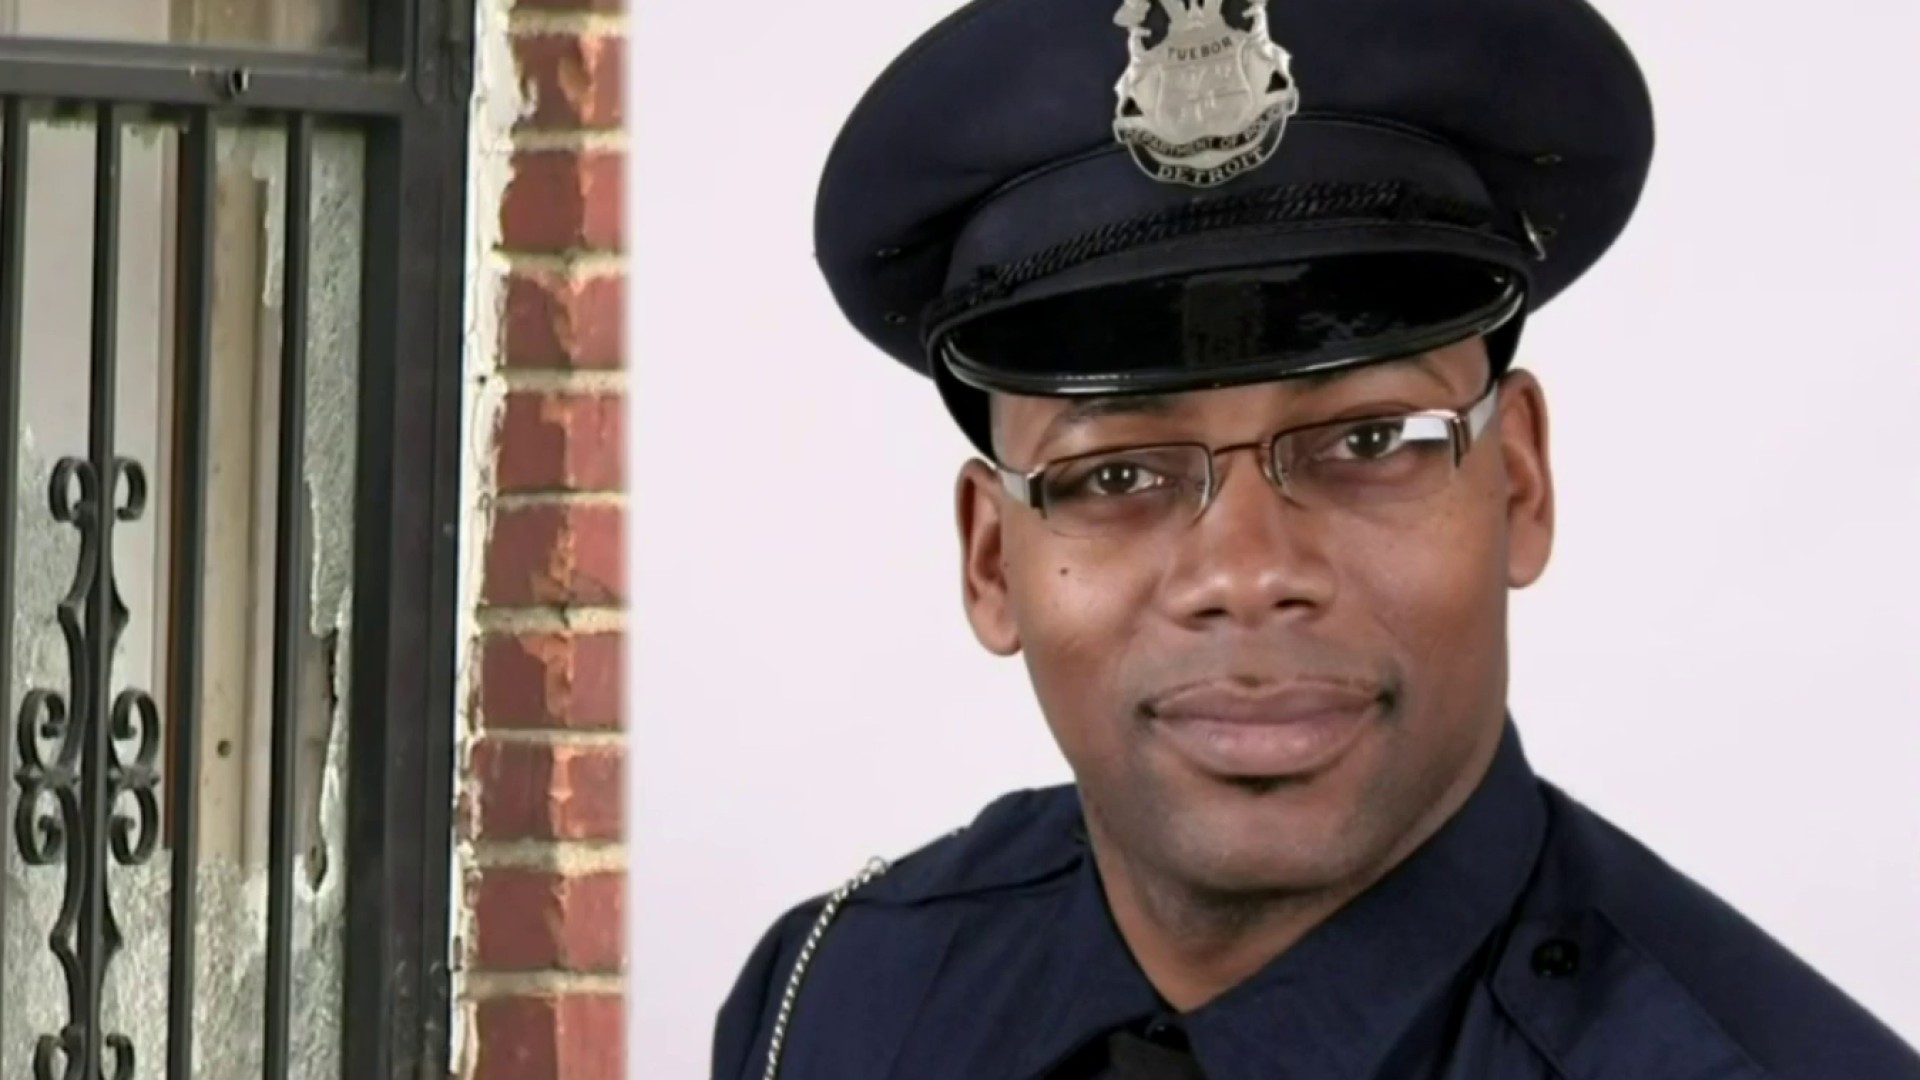 Chief James Craig describes shooting that left veteran Detroit police officer dead - WDIV ClickOnDetroit